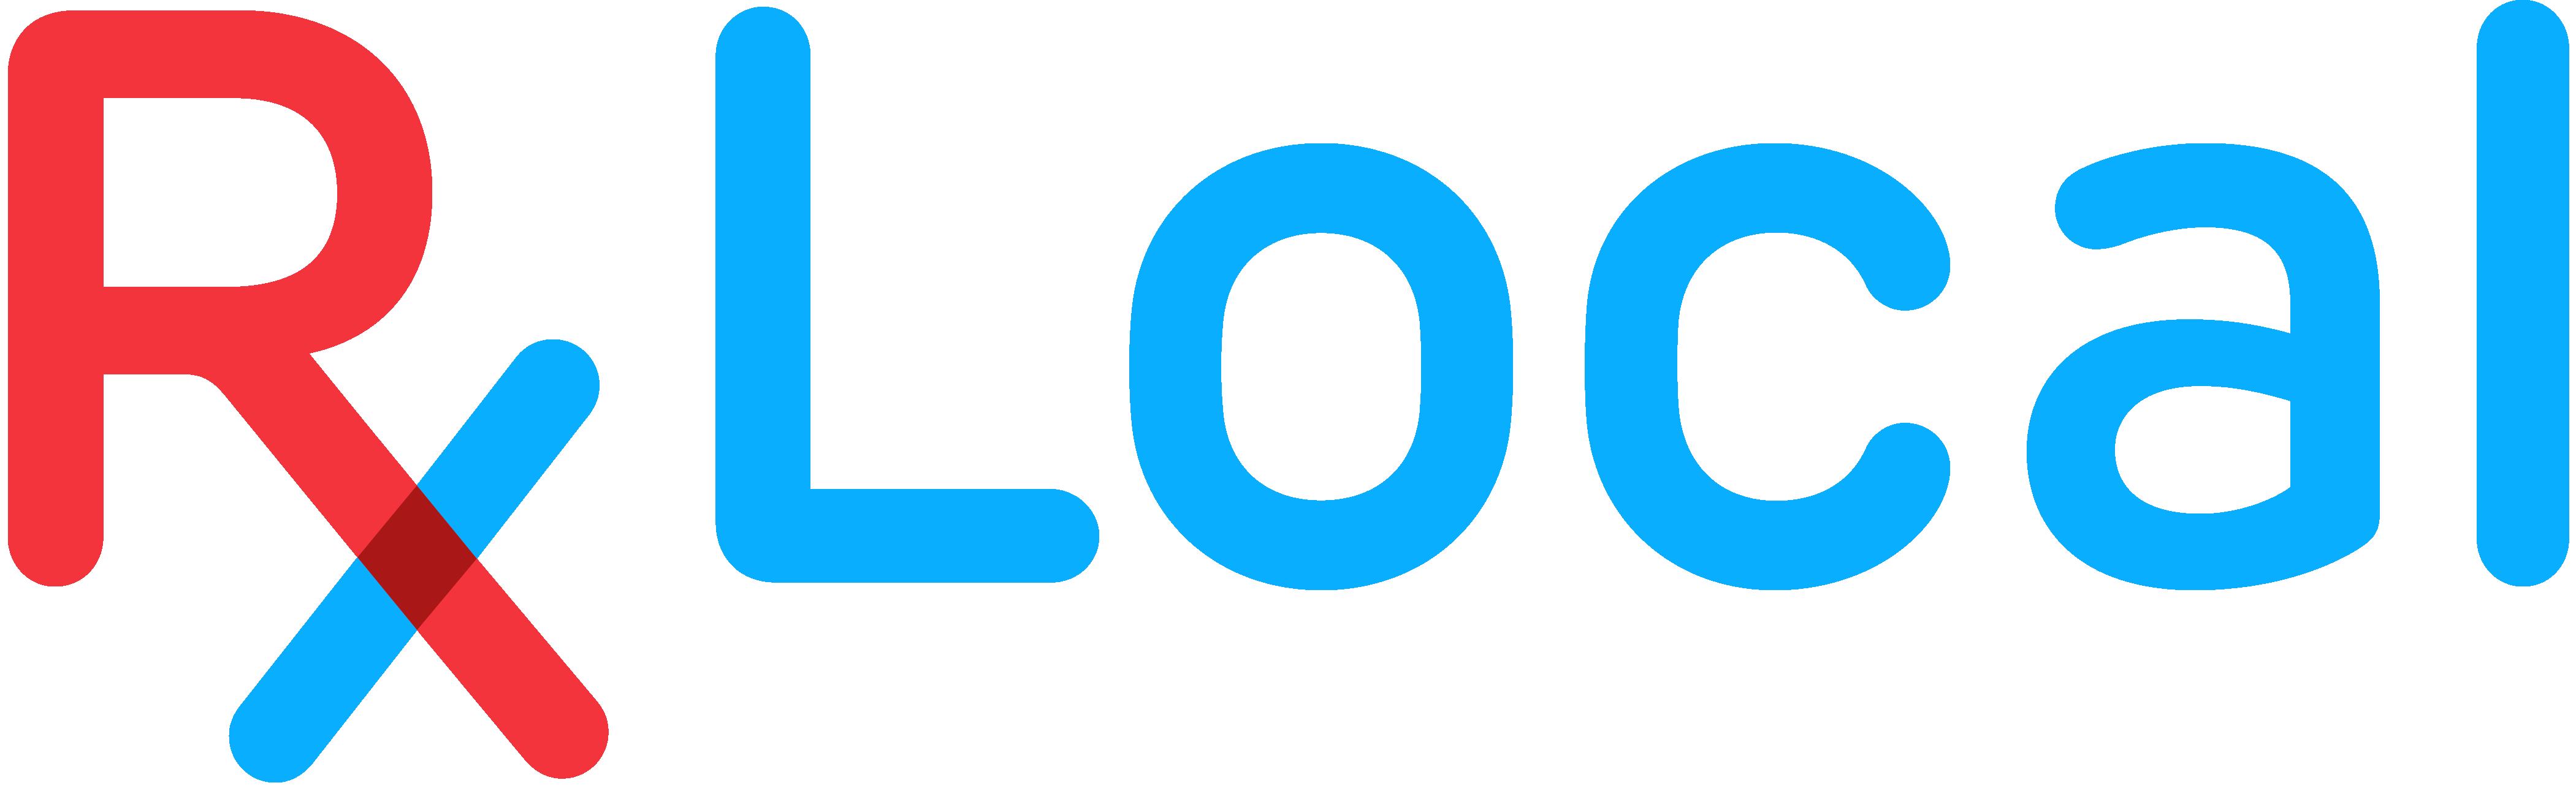 RxLocal Nav bar logo